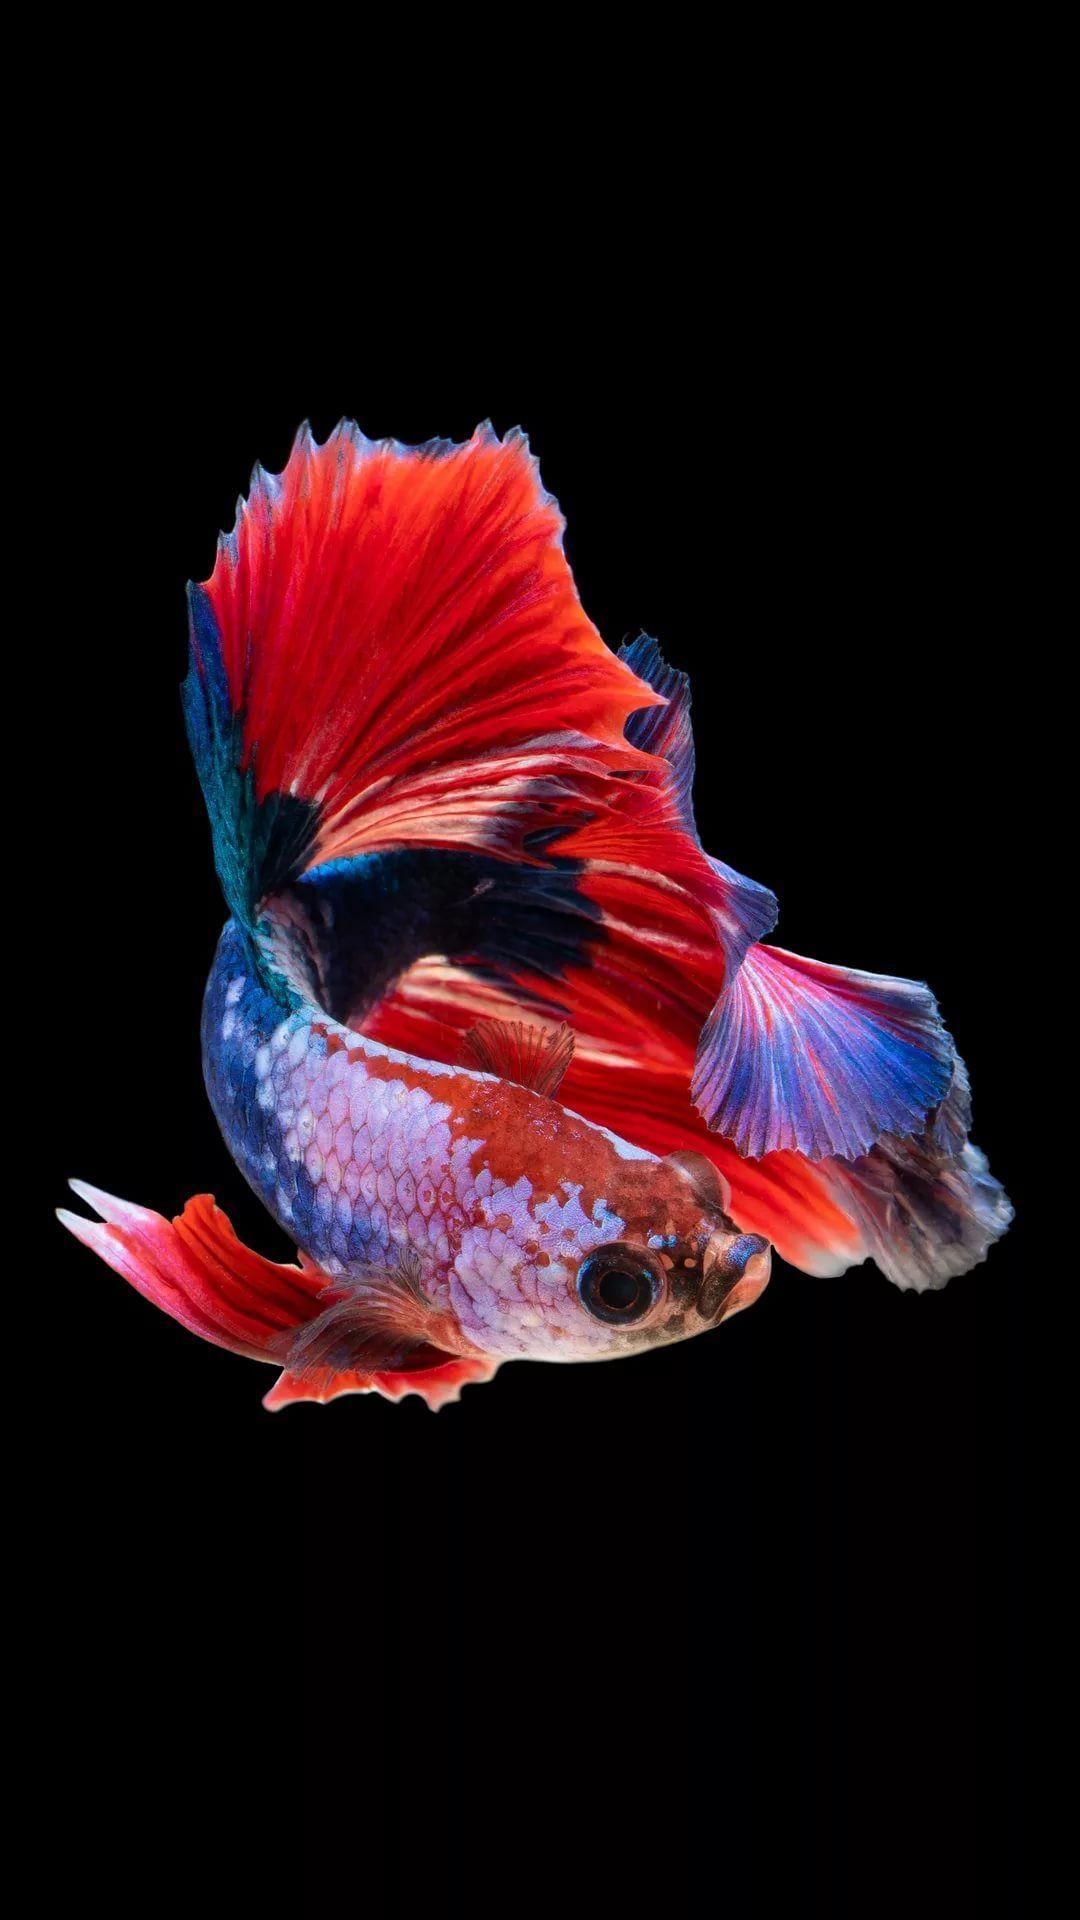 Fish iPhone lock screen wallpaper